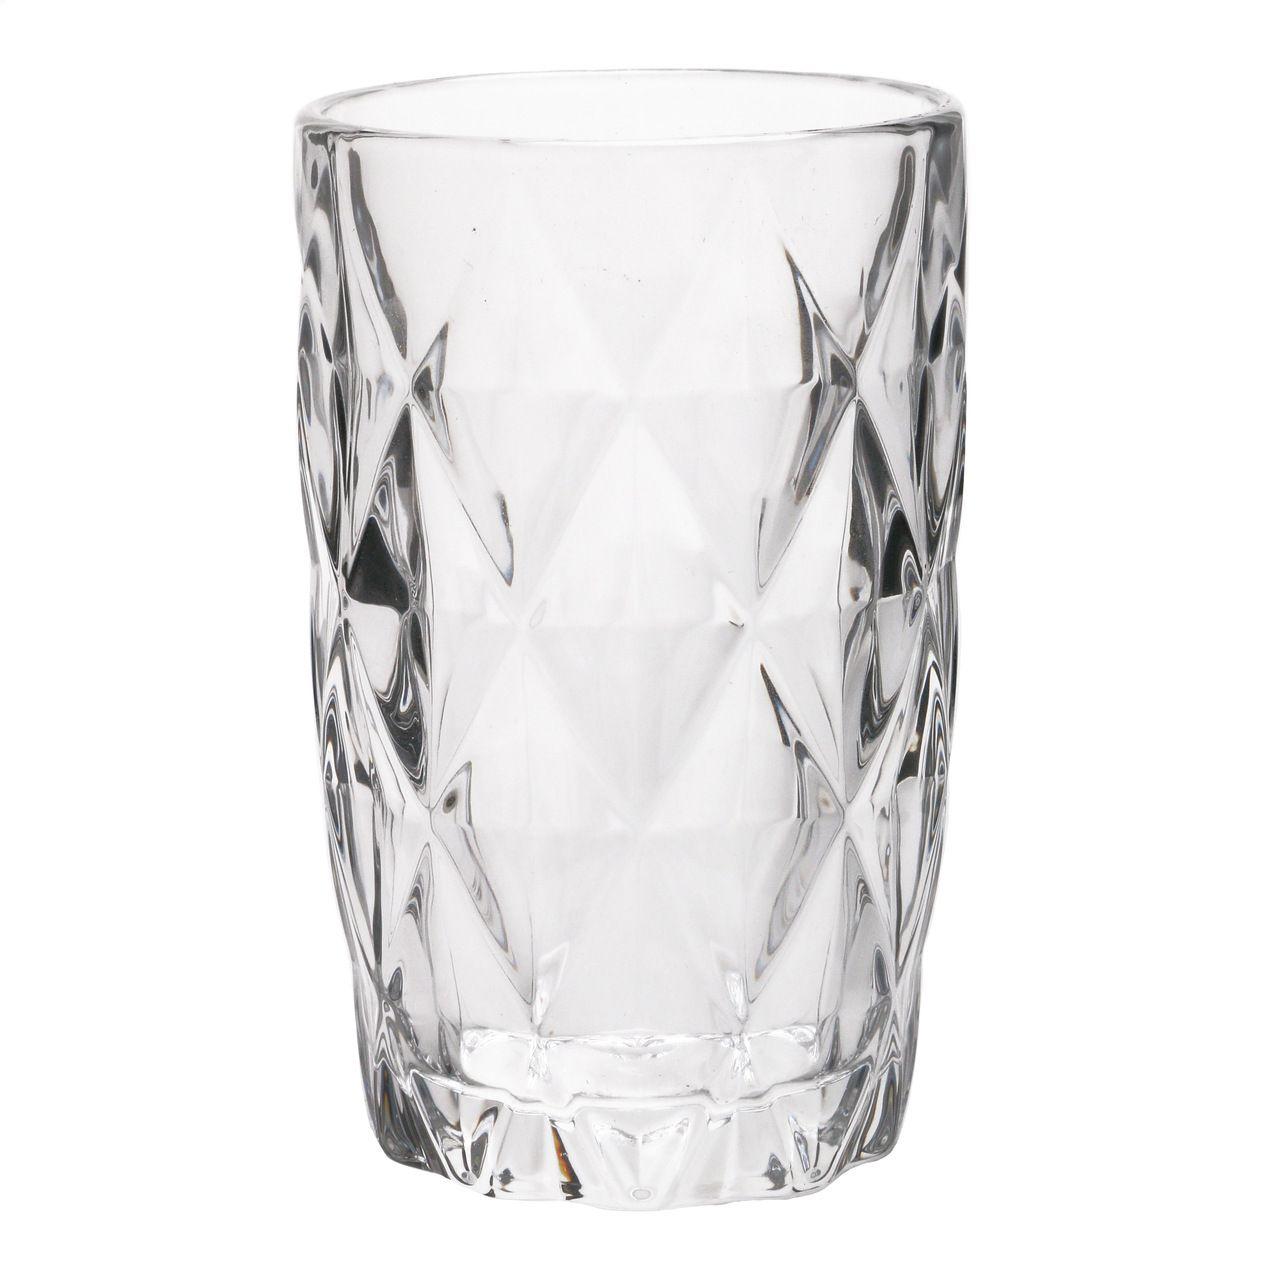 Jg 06 Copos Diamond de Vidro Transparente 350ml